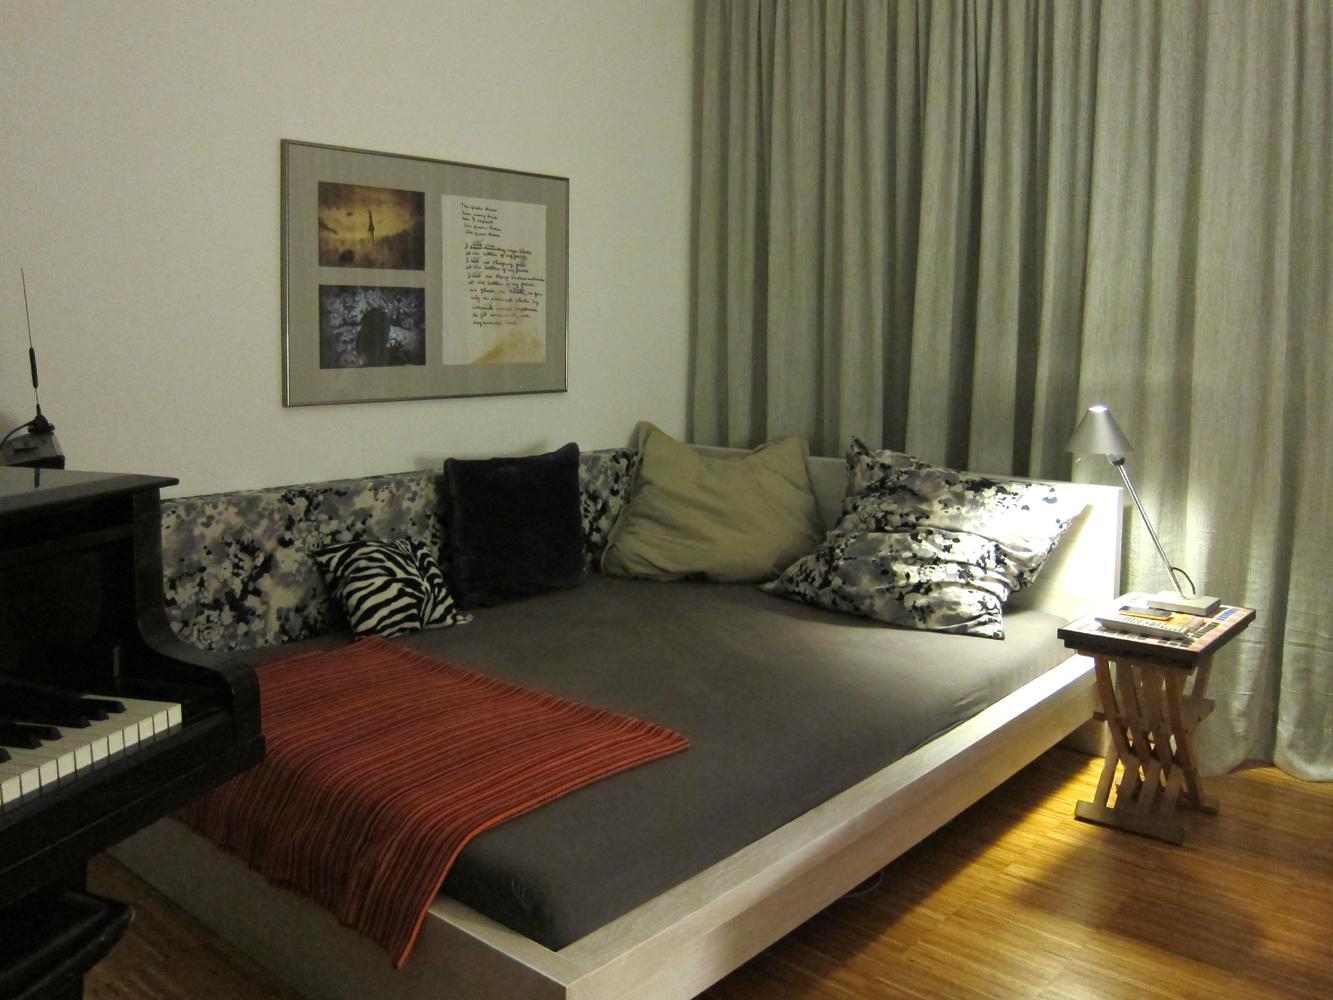 bett mit nachttisch perfect klappbares bett nachttisch cooles design echtholz mbel with bett. Black Bedroom Furniture Sets. Home Design Ideas